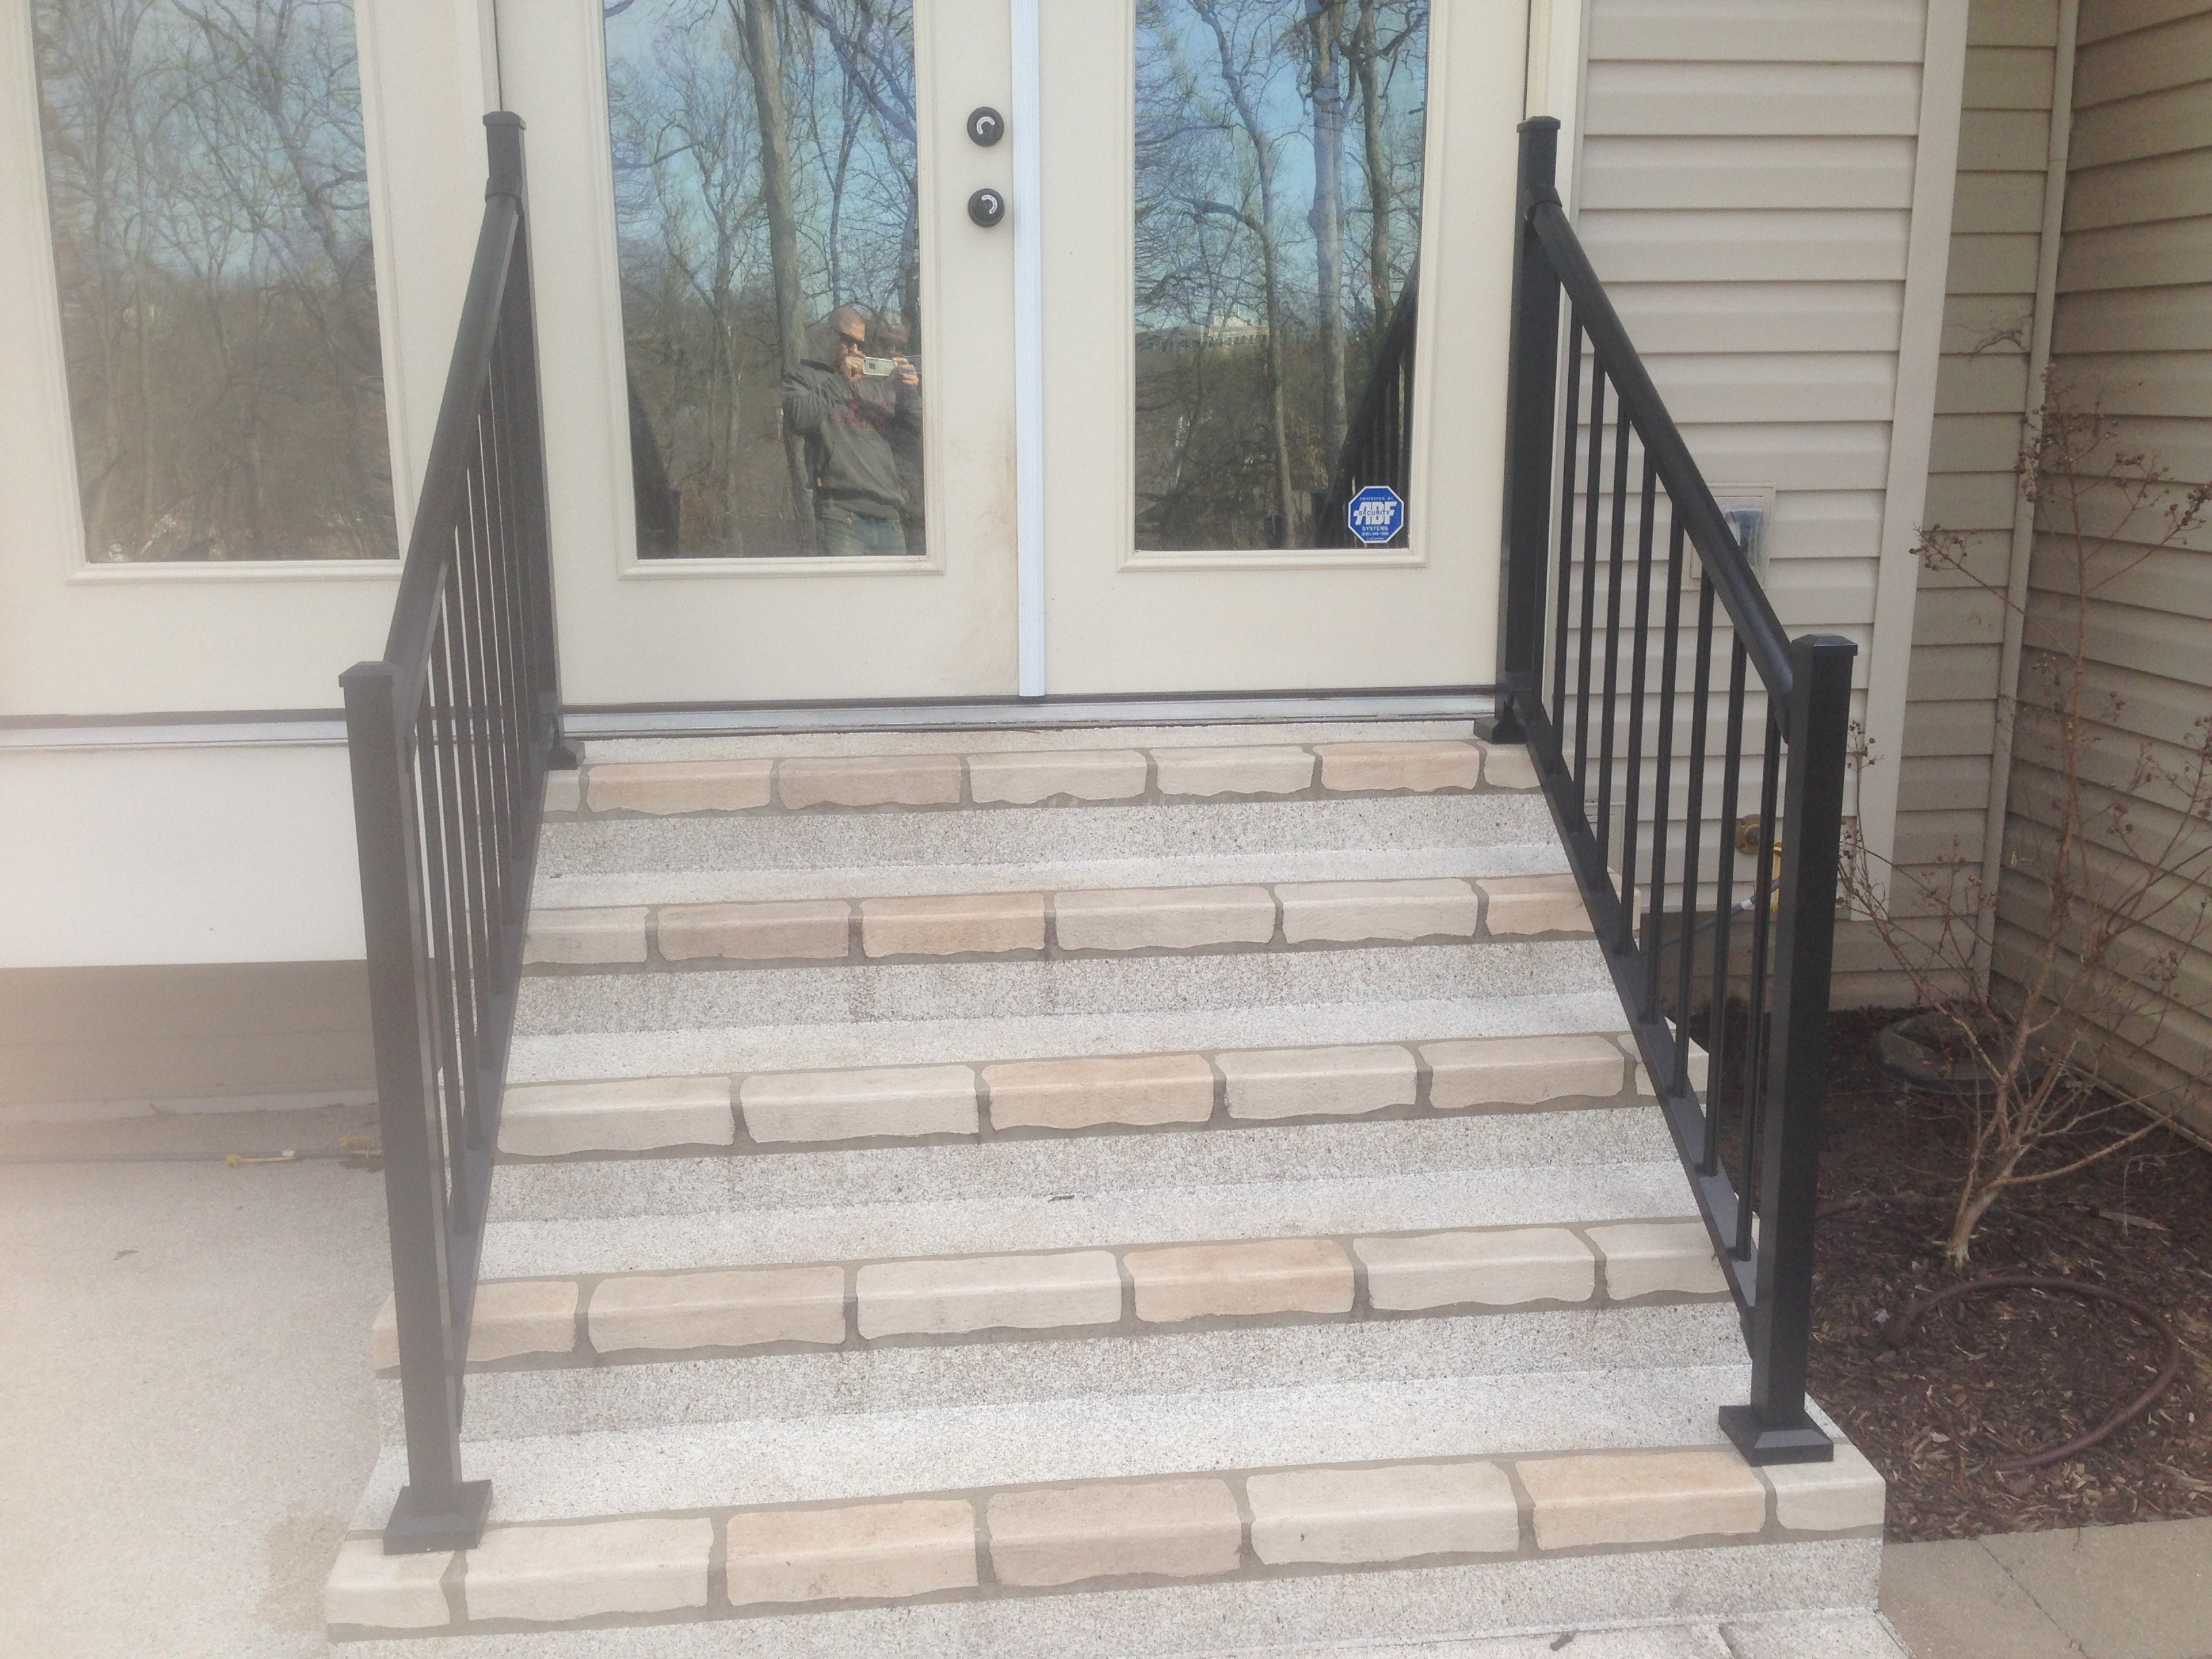 Hardscape / Steps / Rail